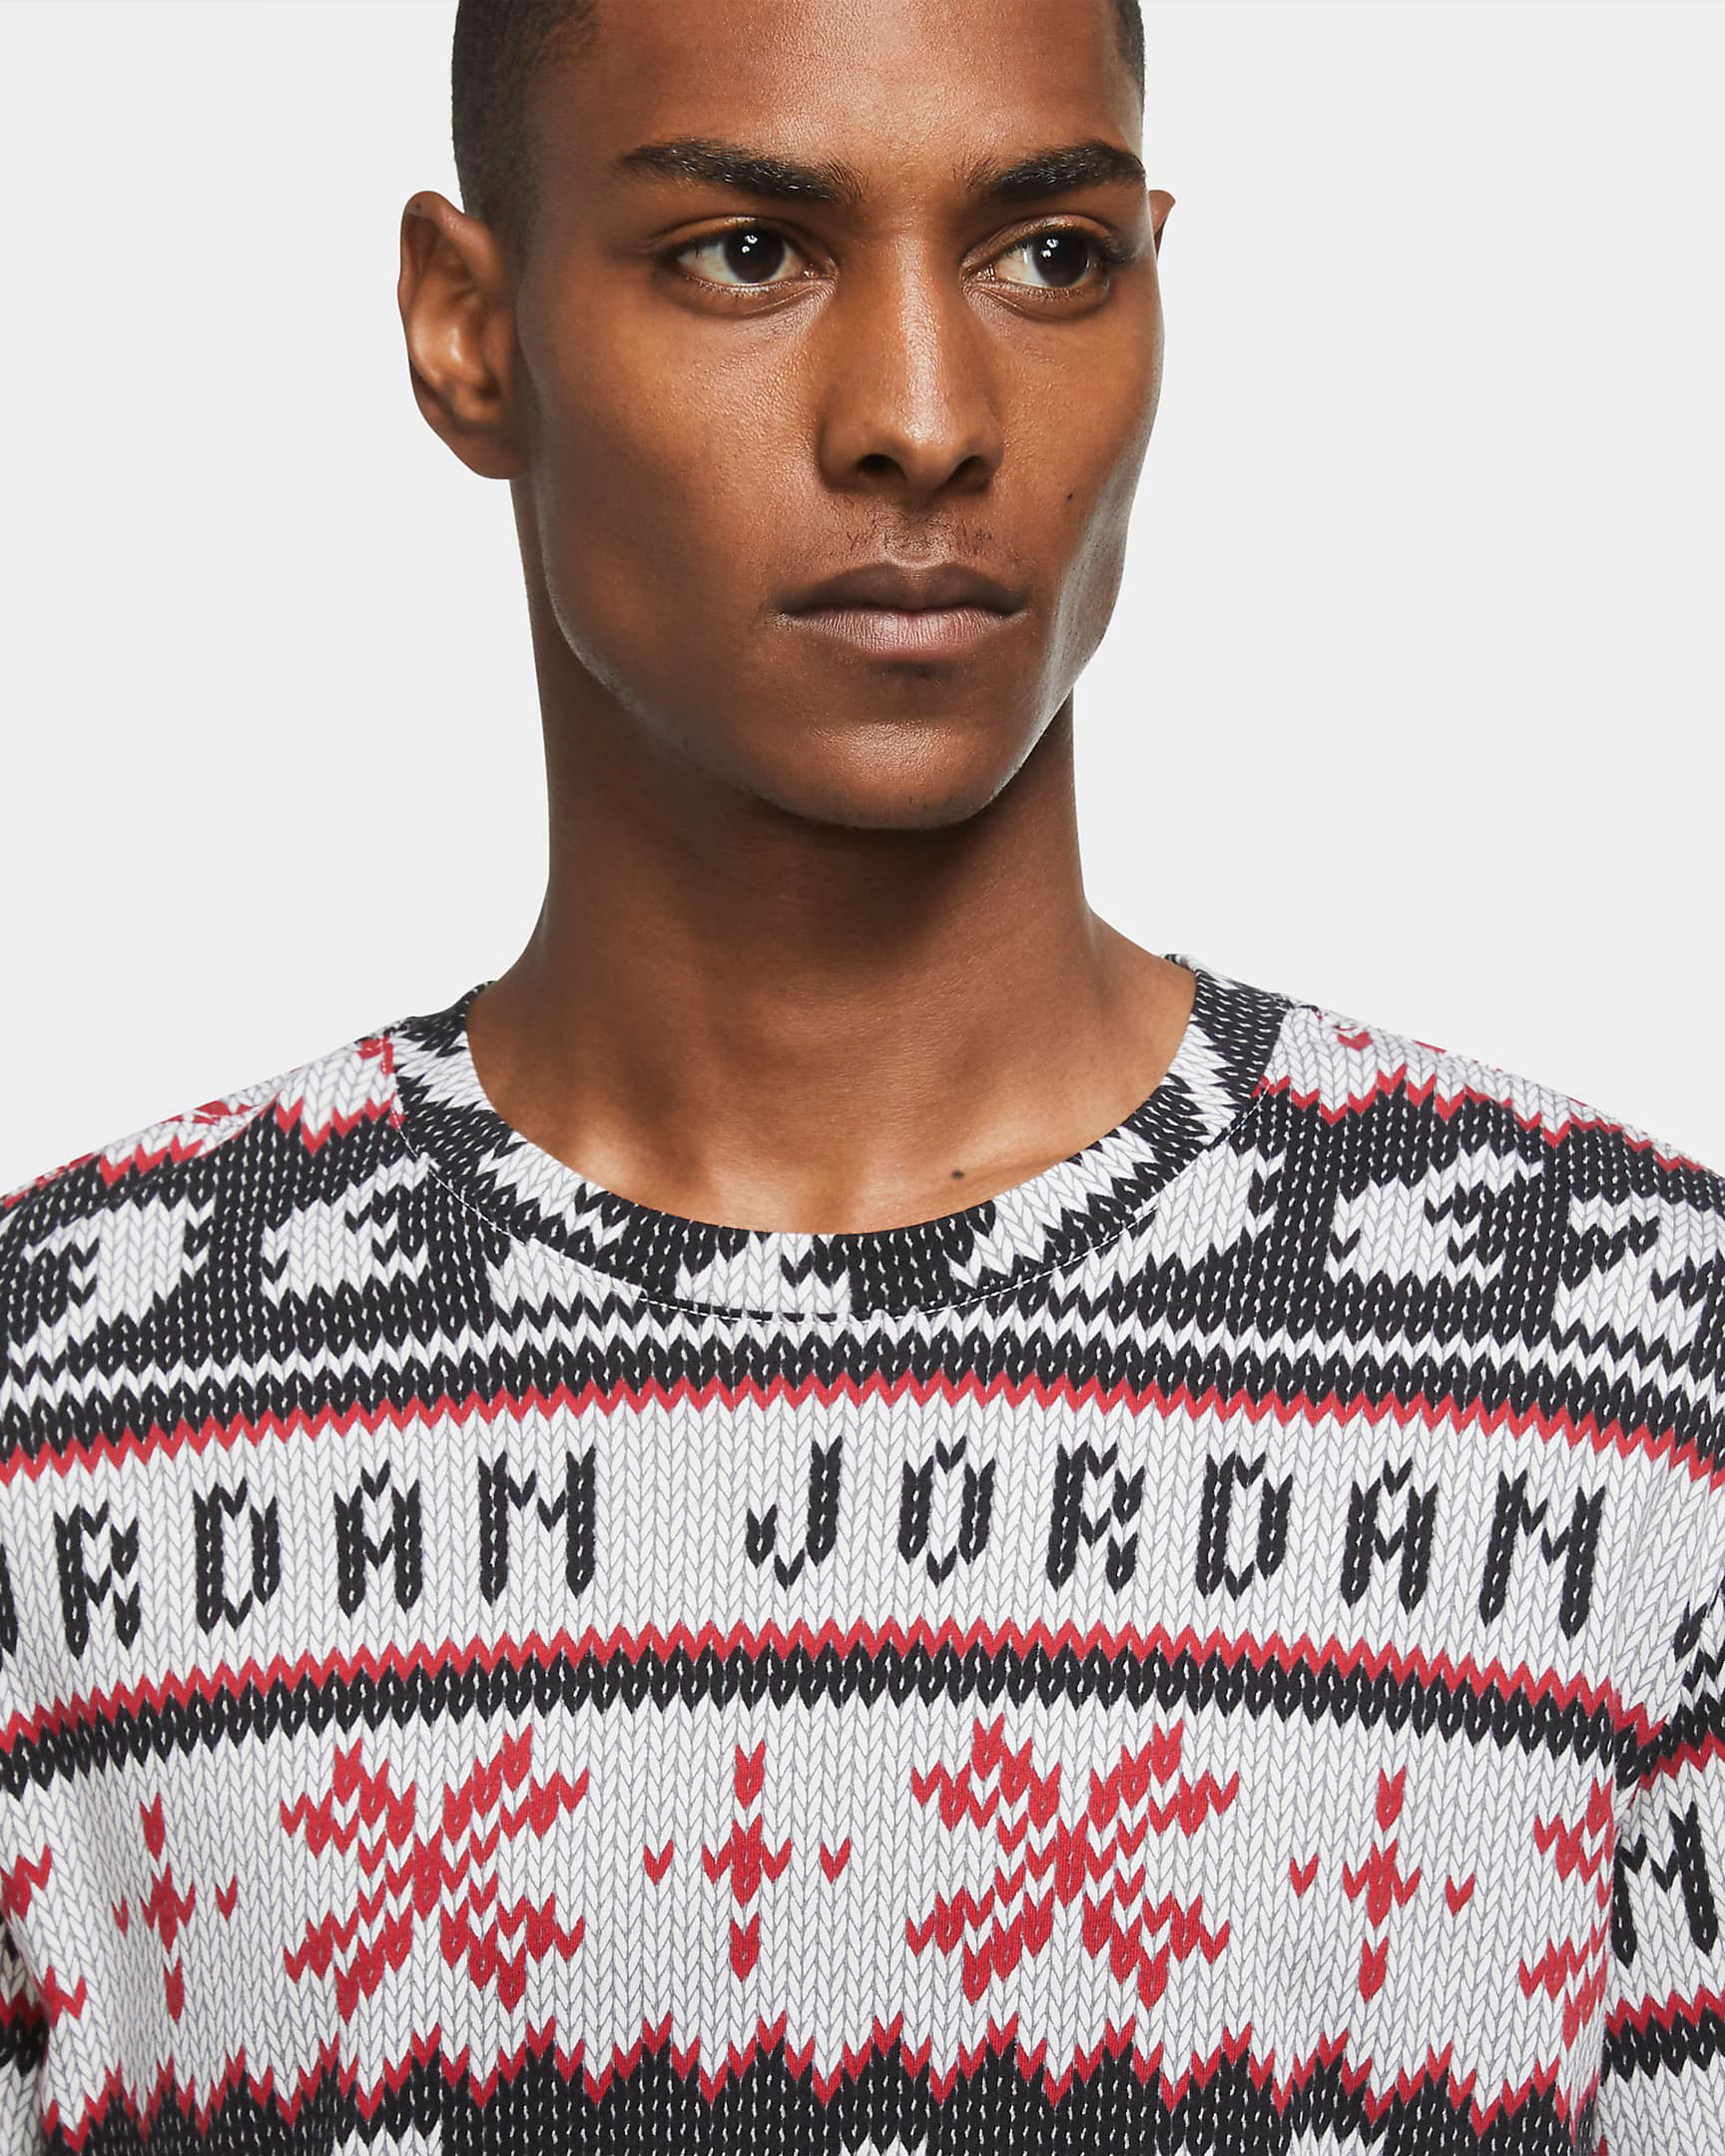 jordan-holiday-ugly-sweater-shirt-white-black-red-3